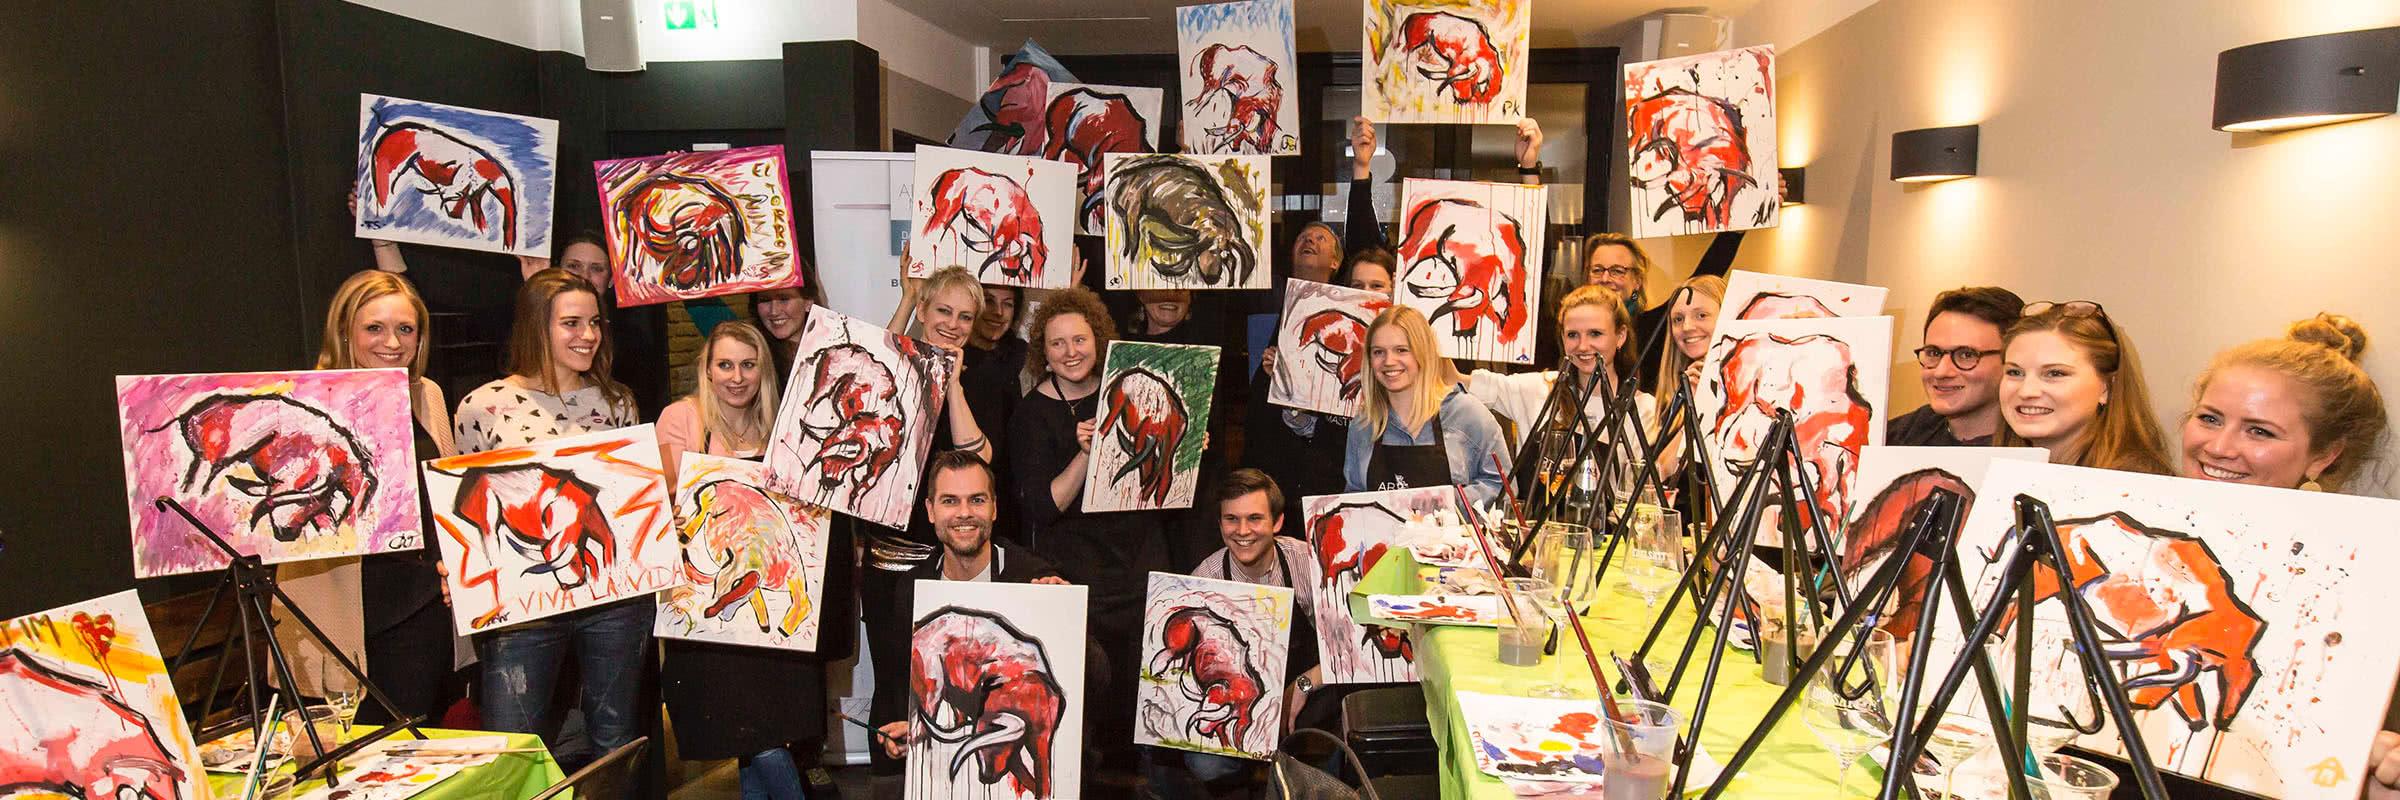 ArtMasters Event